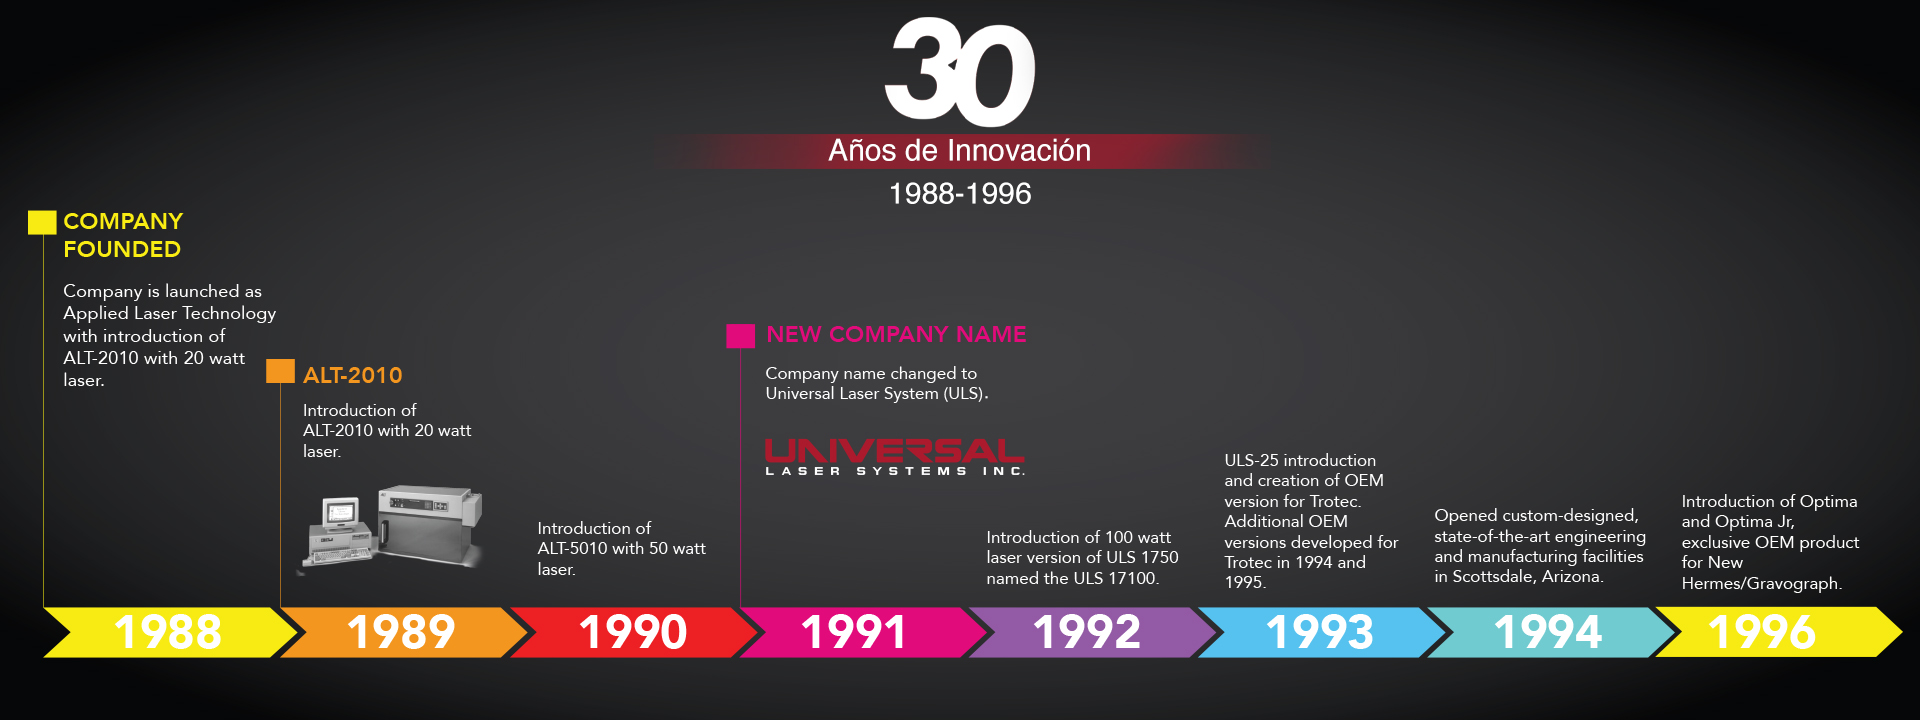 ULS Spanish Timeline 1